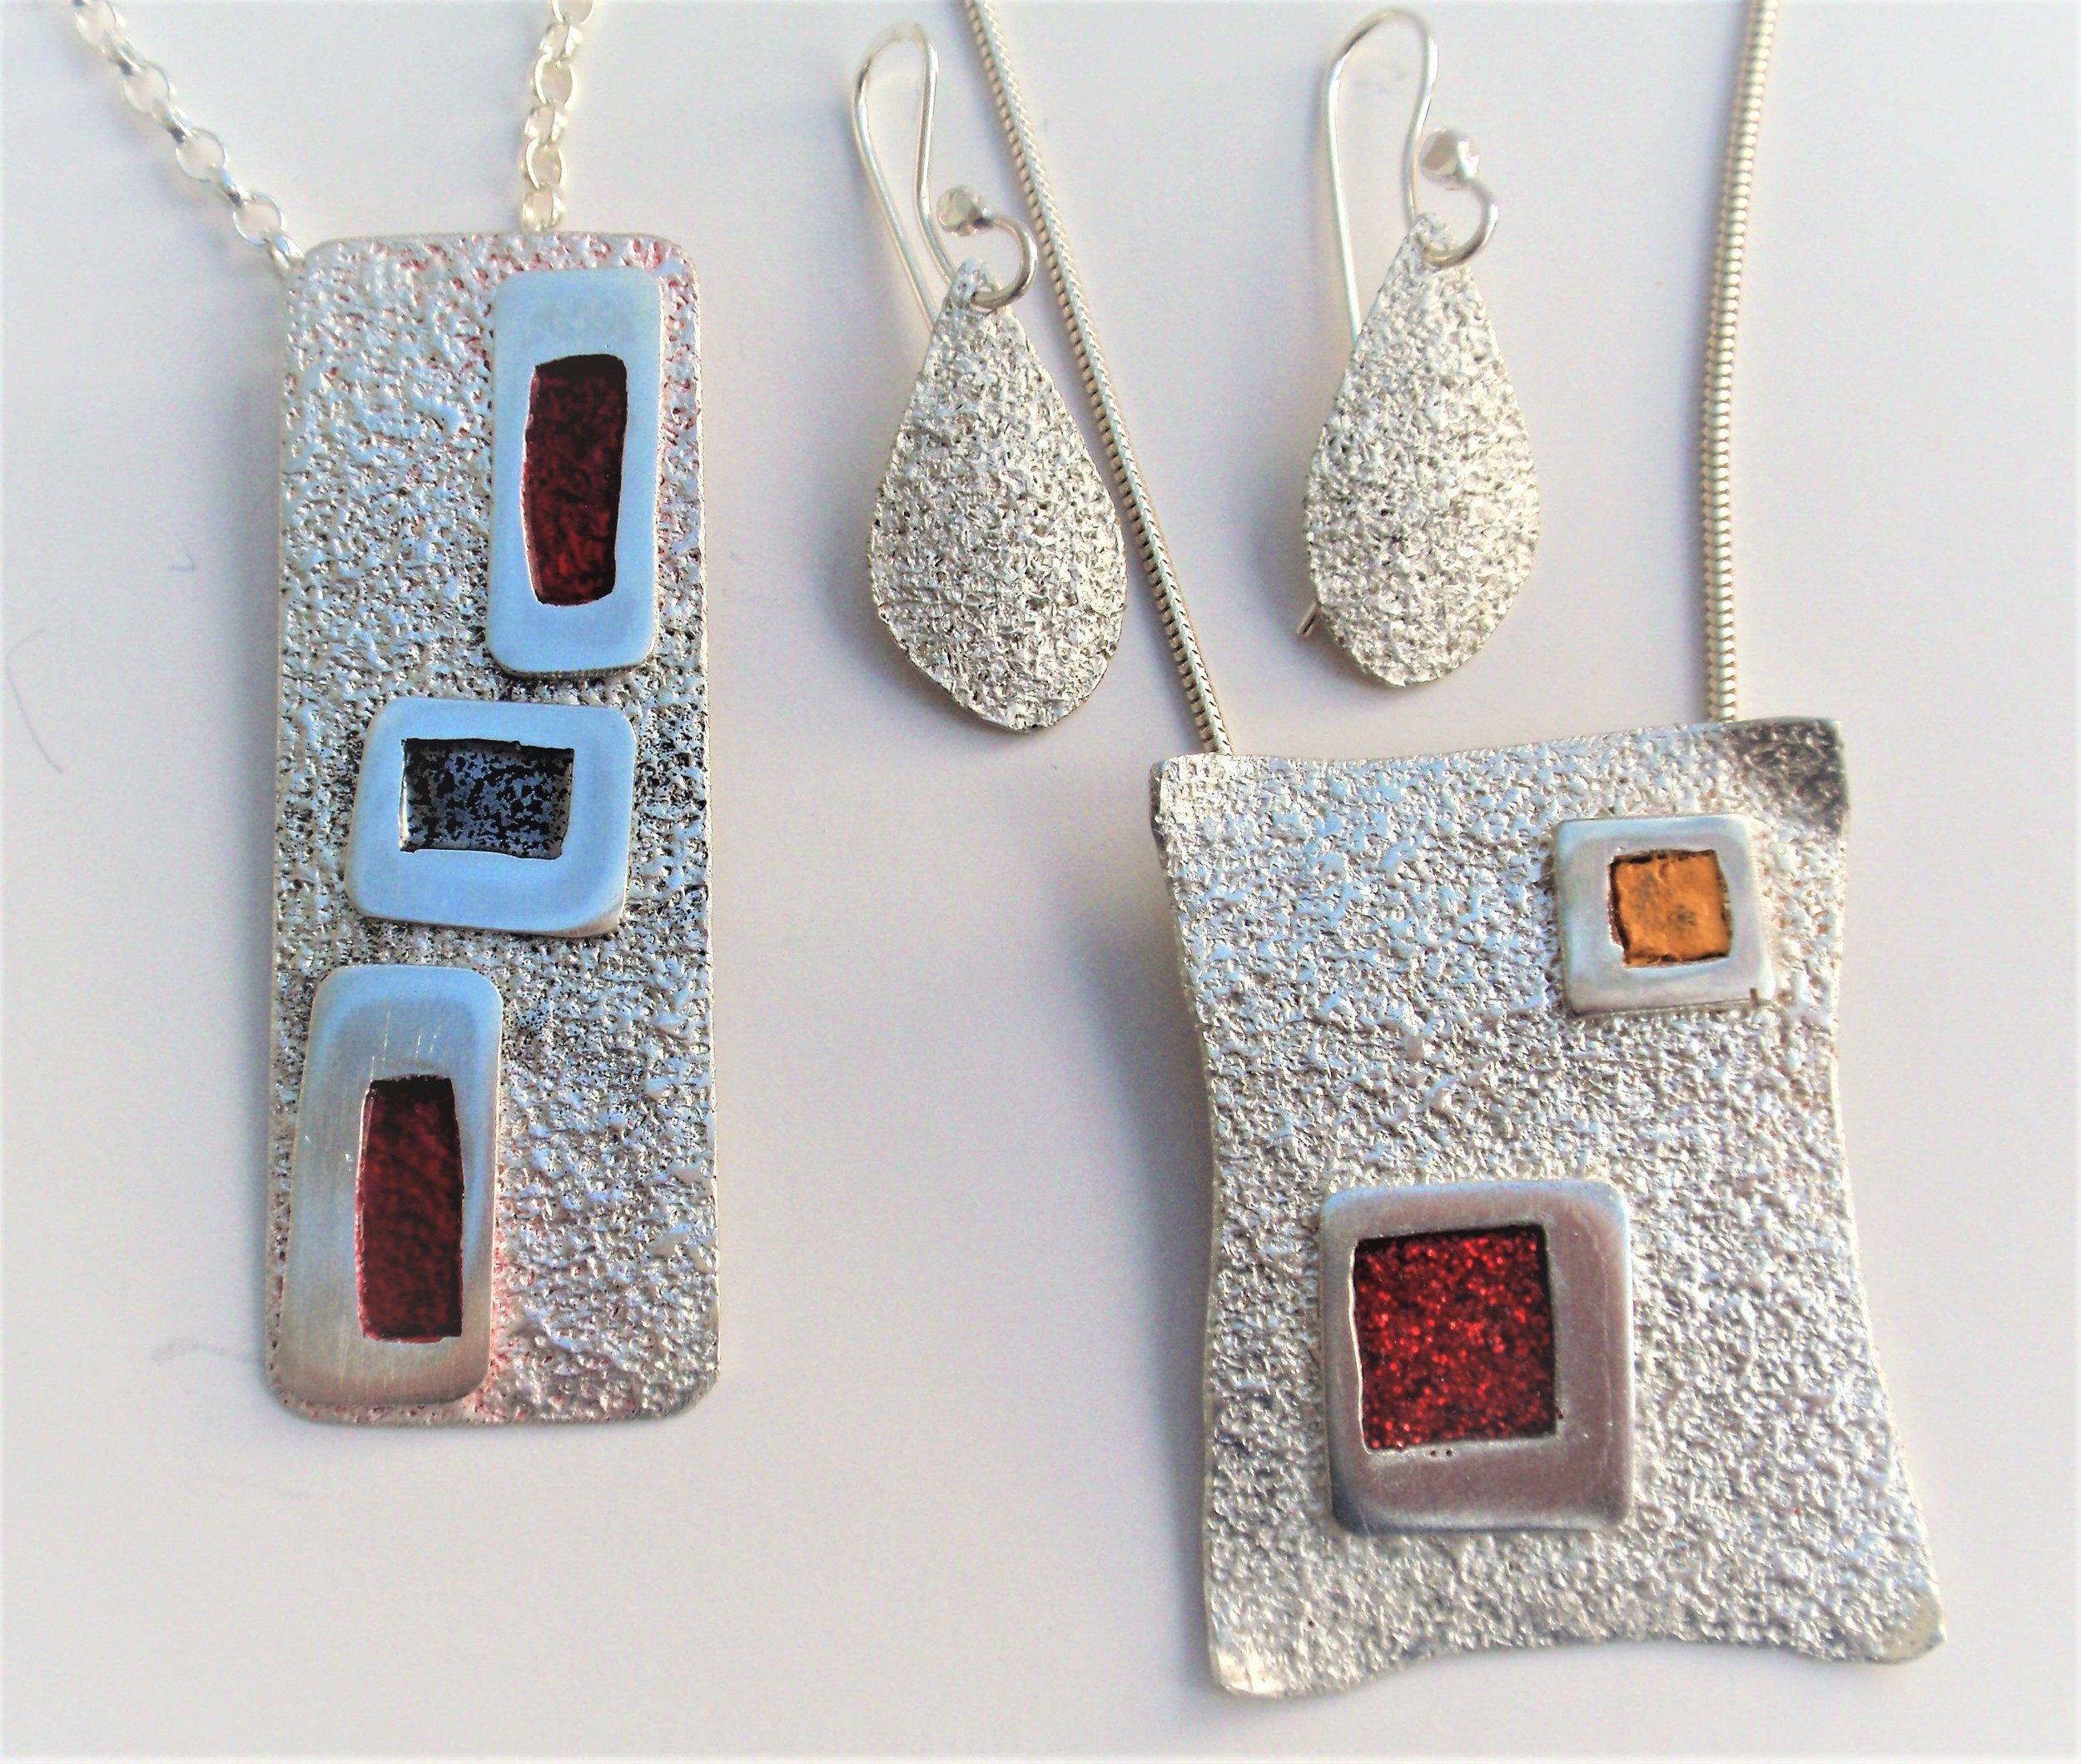 sandy ball website - rectangle necklace.JPG